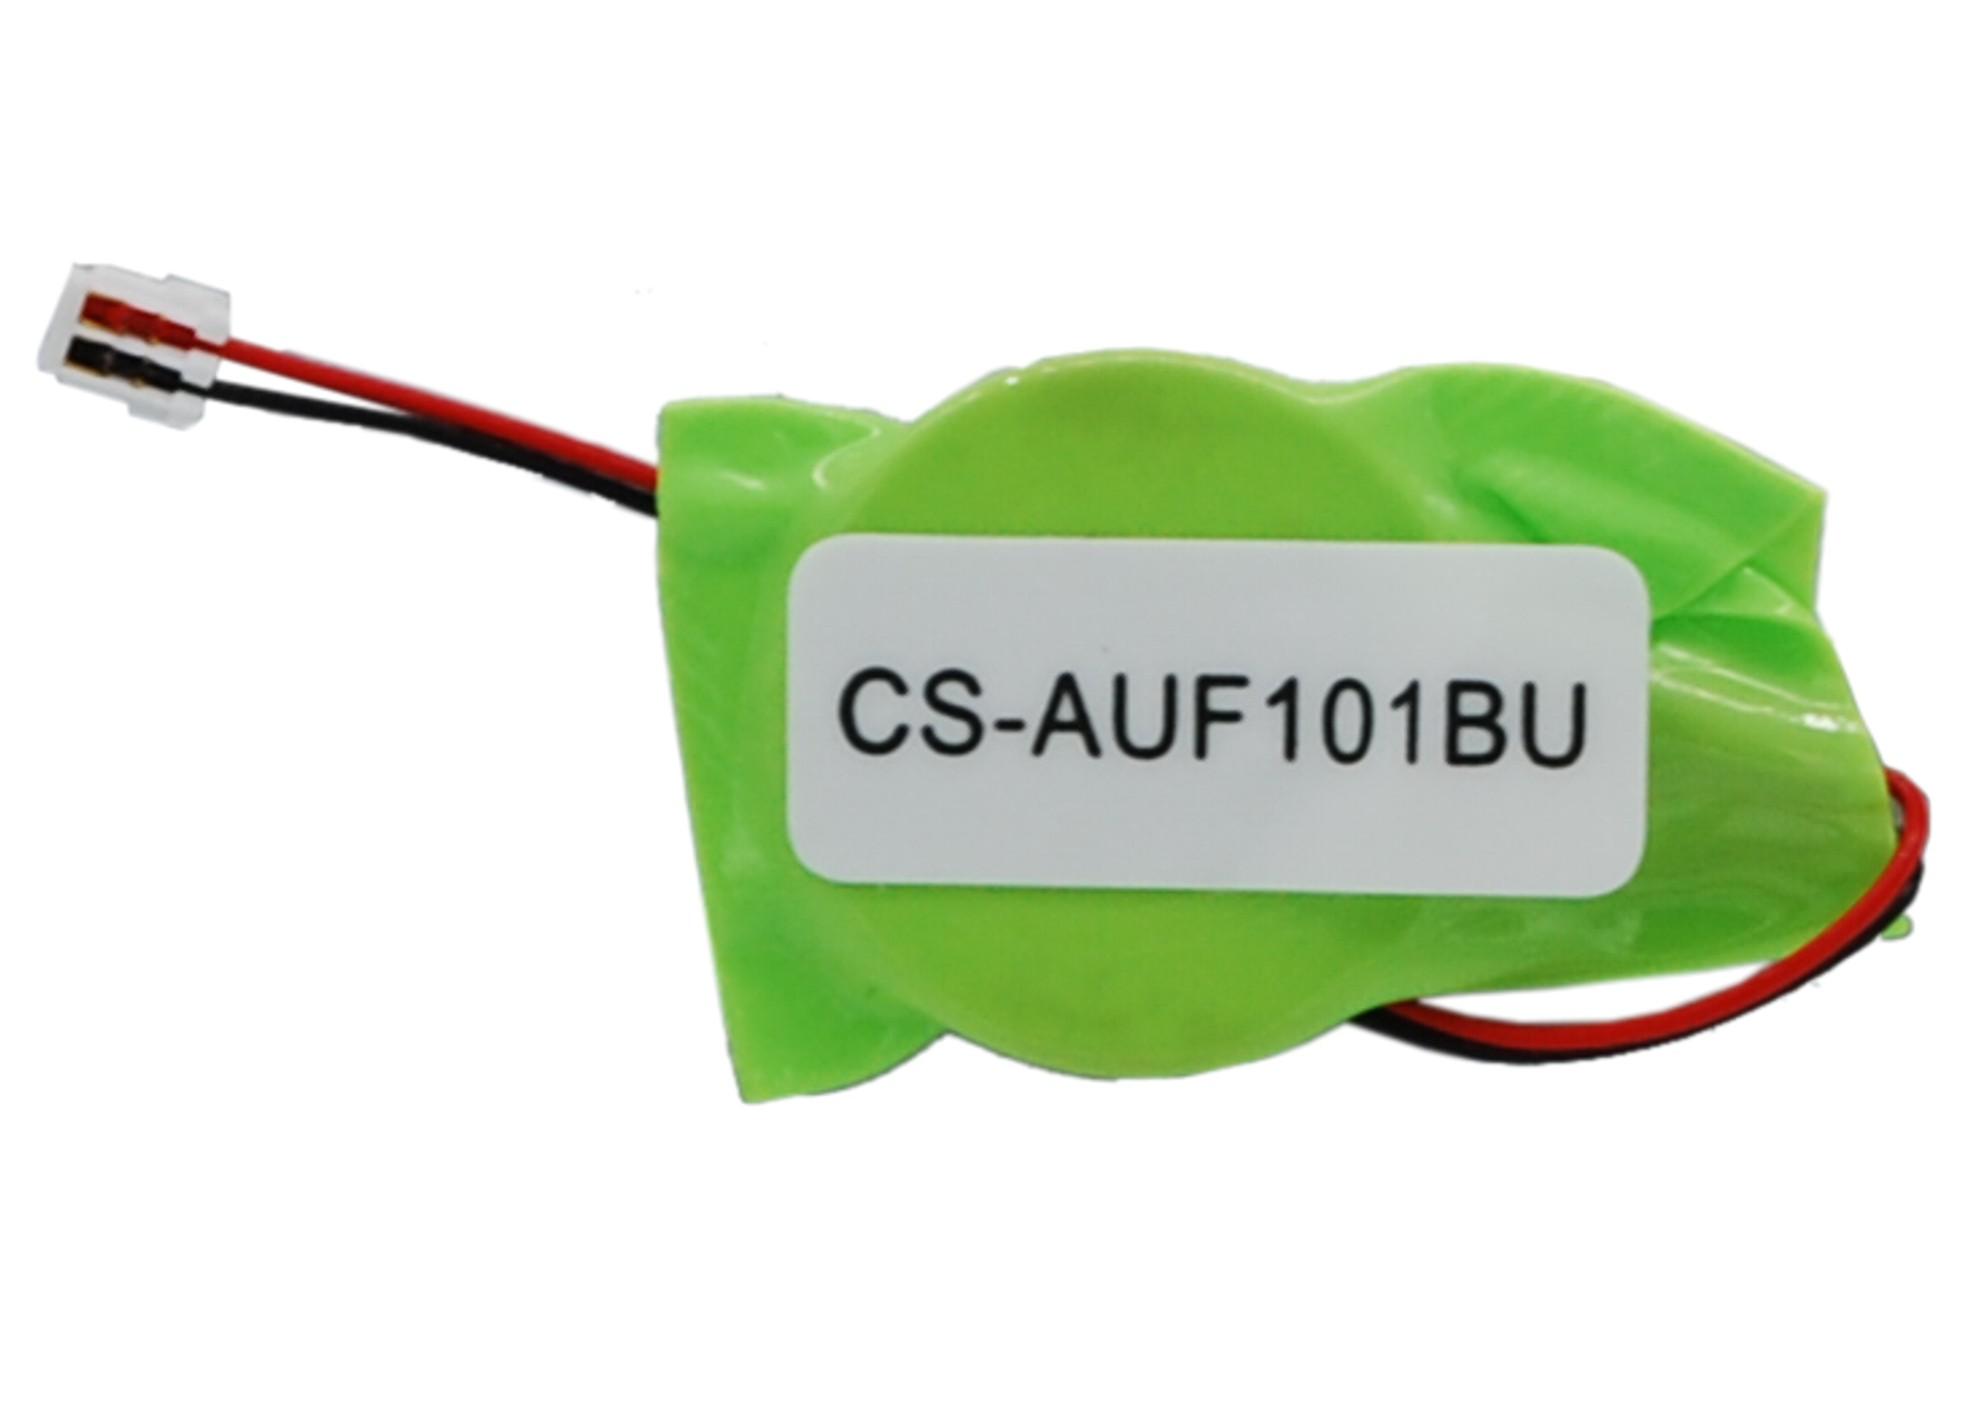 Cameron Sino baterie cmos pro ASUS Eee Pad Transformer TF101-1B023A 3V Li-ion 40mAh zelená - neoriginální